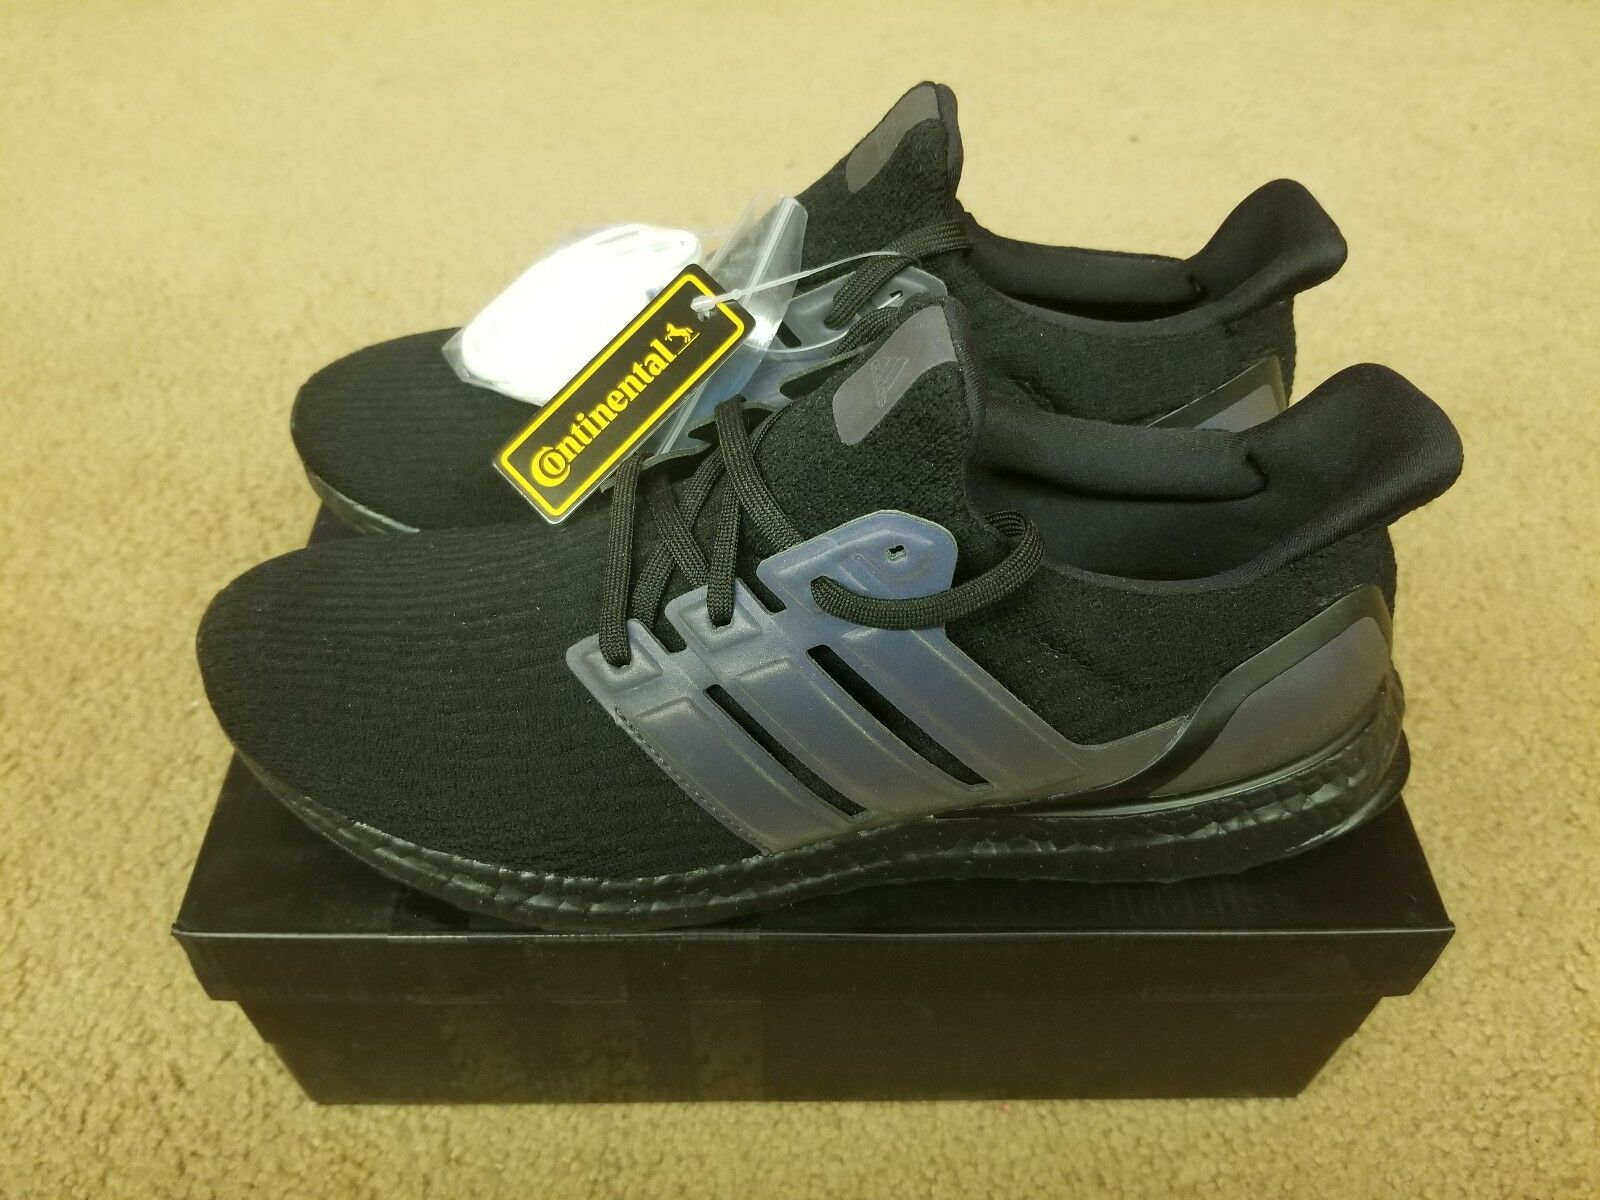 Adidas ultra Boost - Triple Negro - Xeno - Boost tamaño 11,5 - 100% autentico - miAdidas edc8af